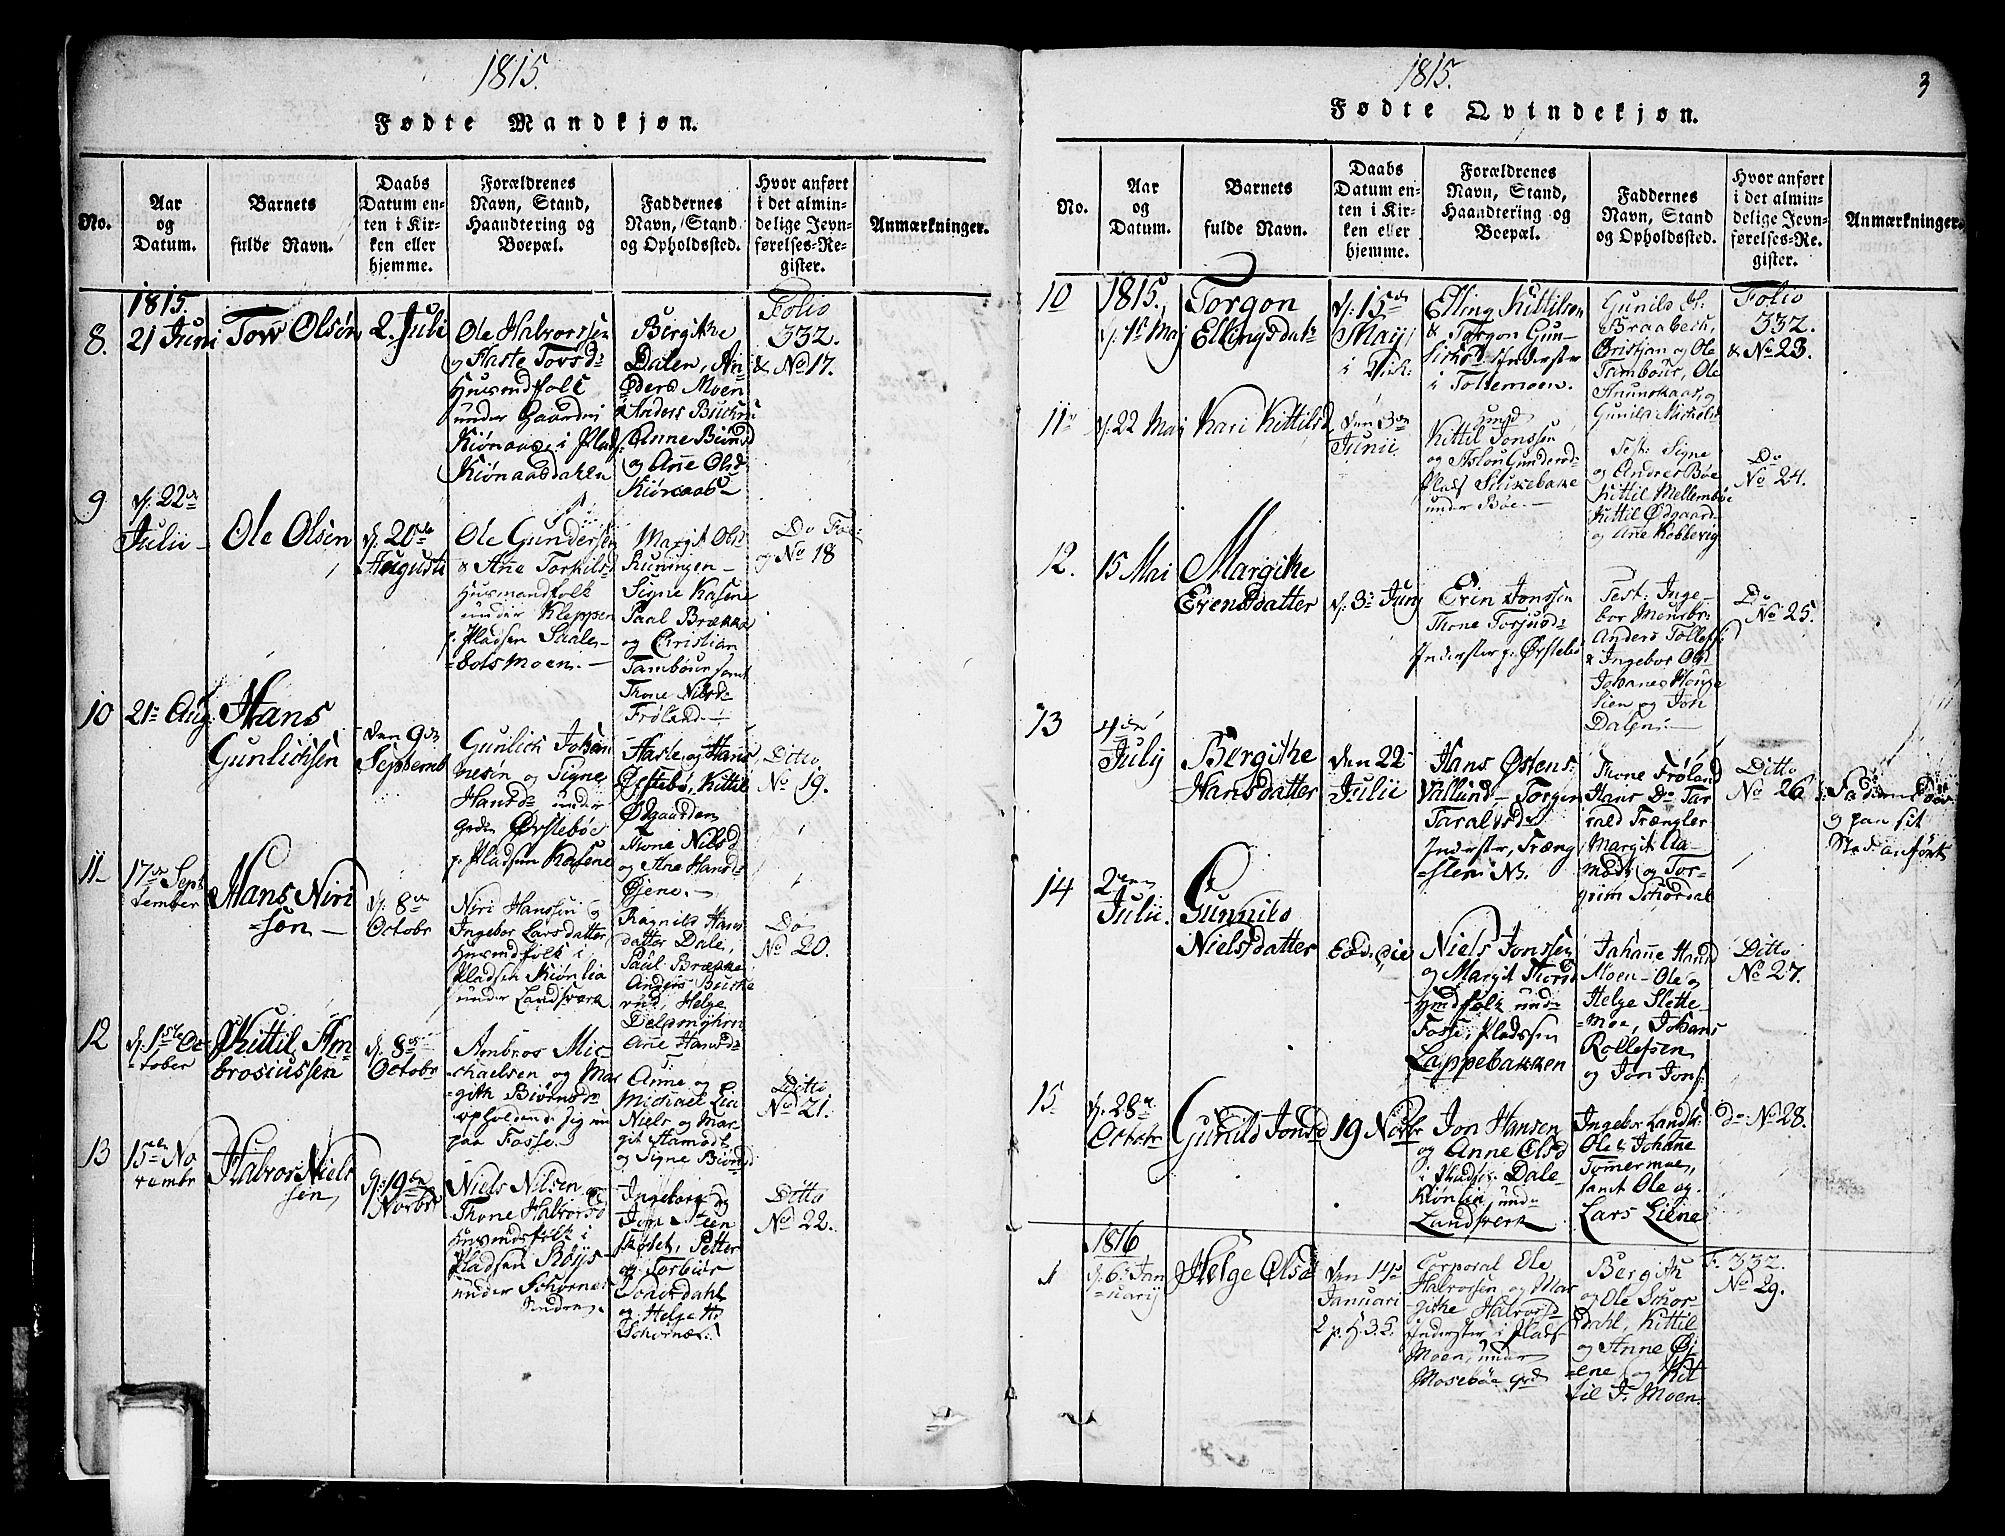 SAKO, Hjartdal kirkebøker, G/Gb/L0001: Klokkerbok nr. II 1, 1815-1842, s. 3